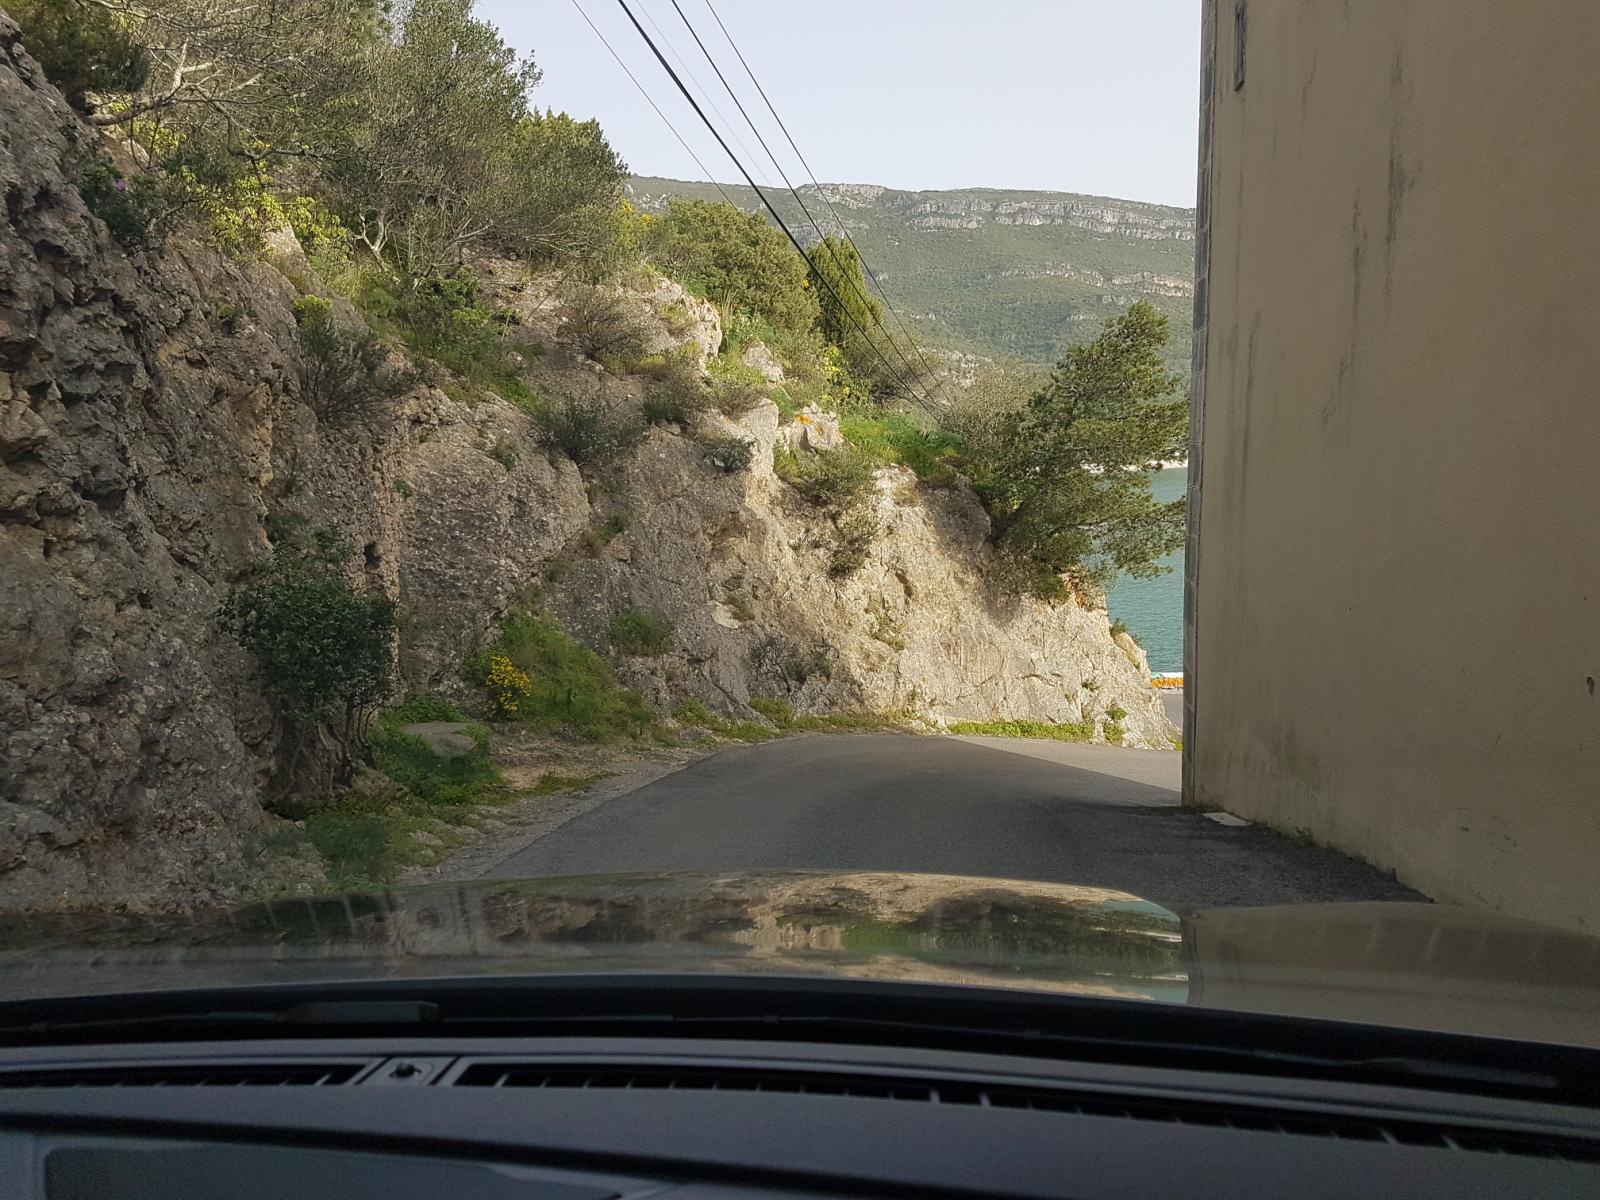 Droga w Portugalii